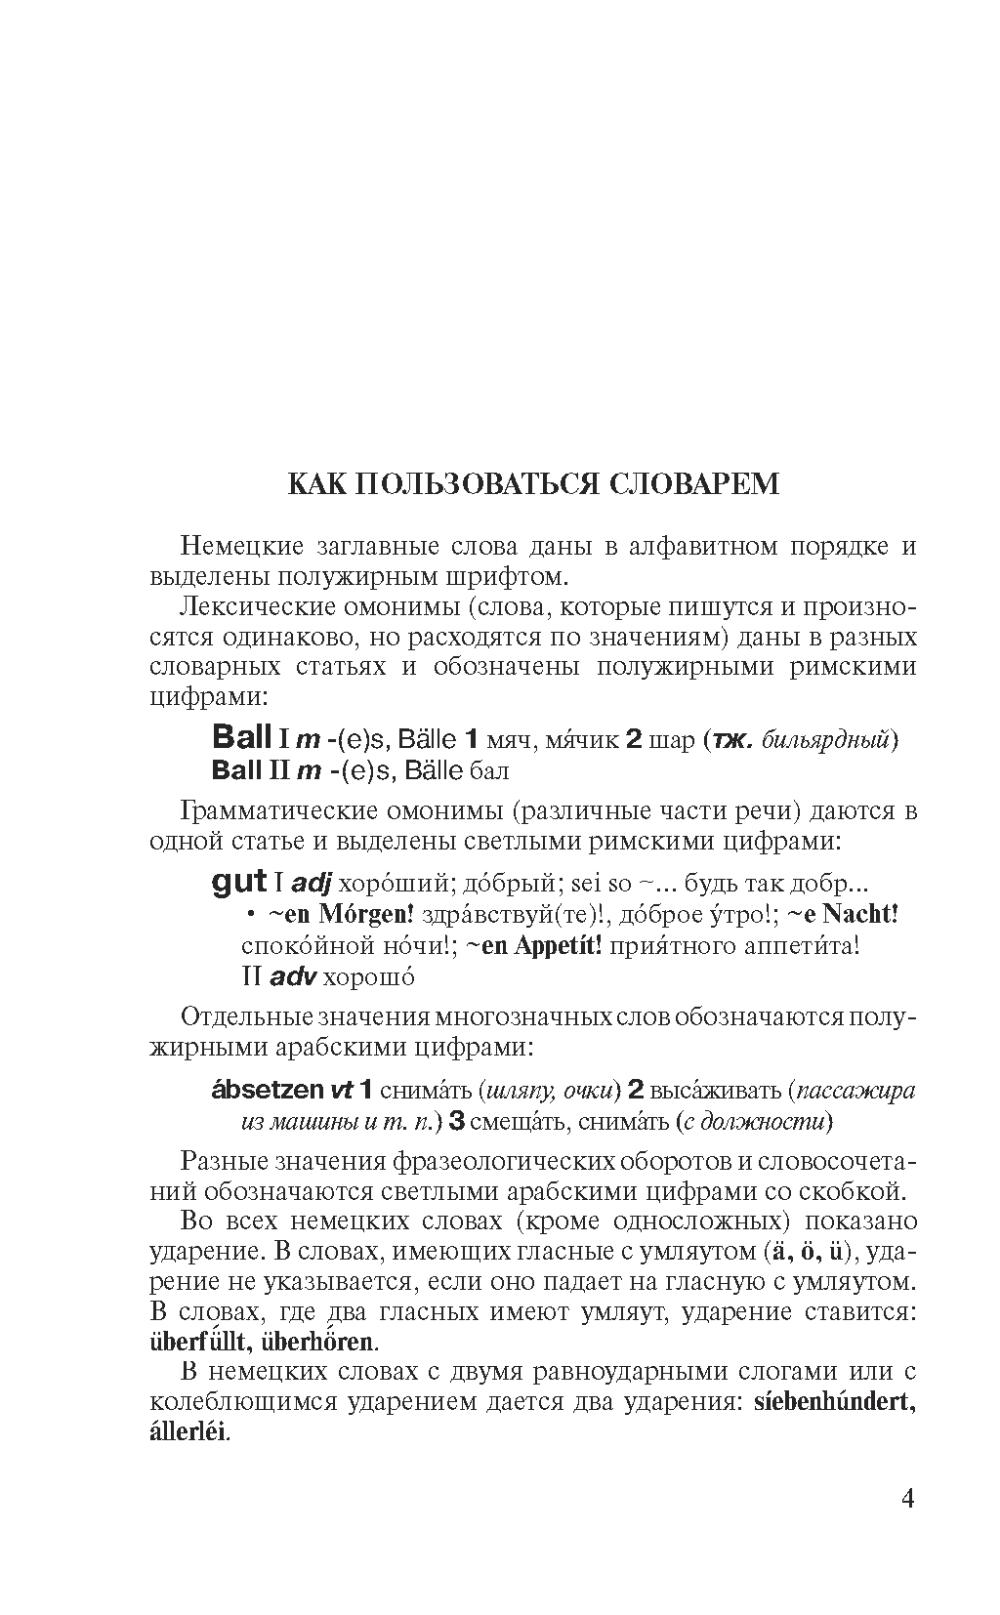 http://i6.imageban.ru/out/2013/12/02/8b6b60c8a7c8b2c72b797647eaf3d7f3.jpg